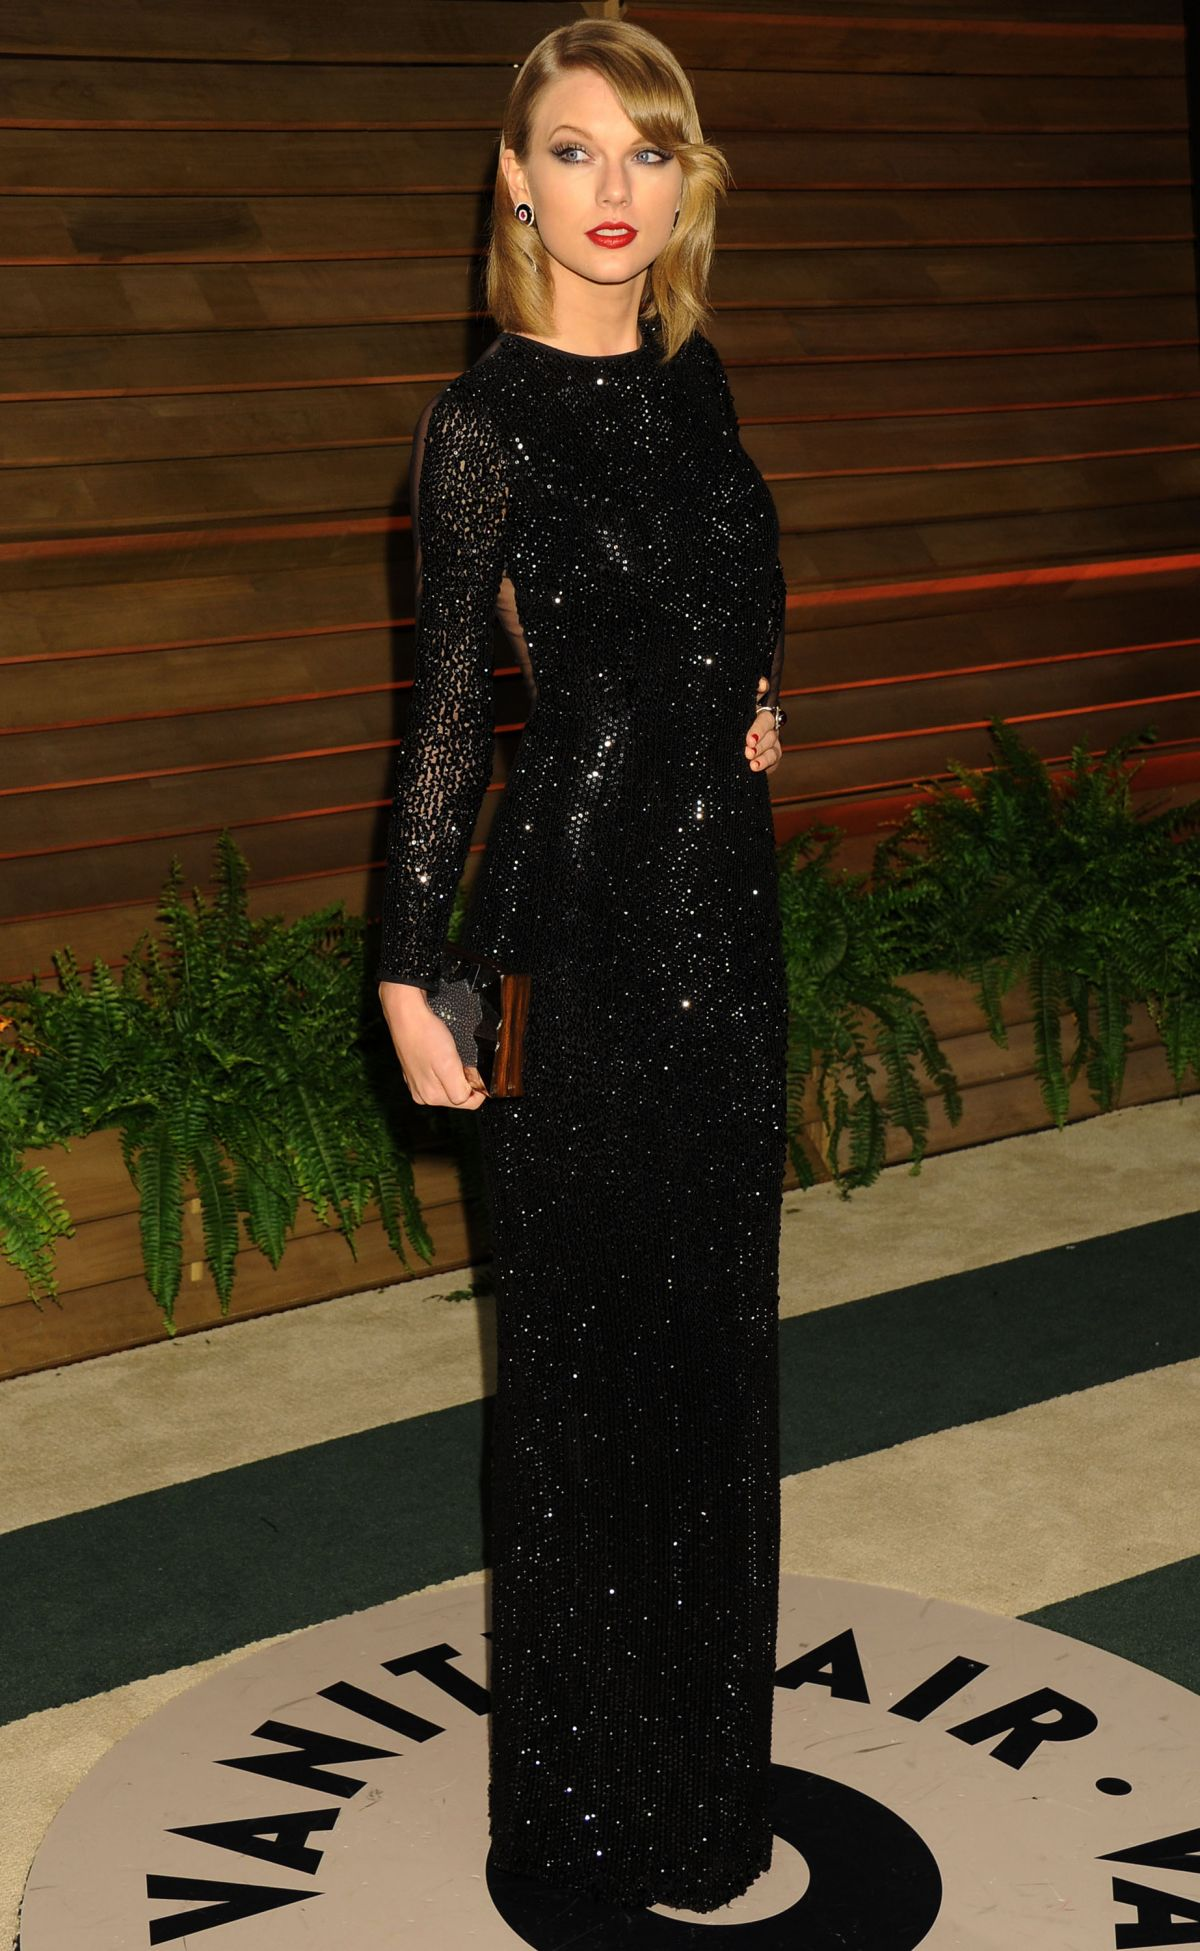 TAYLOR SWIFT at Vanity Fair Oscar Party in Hollywood